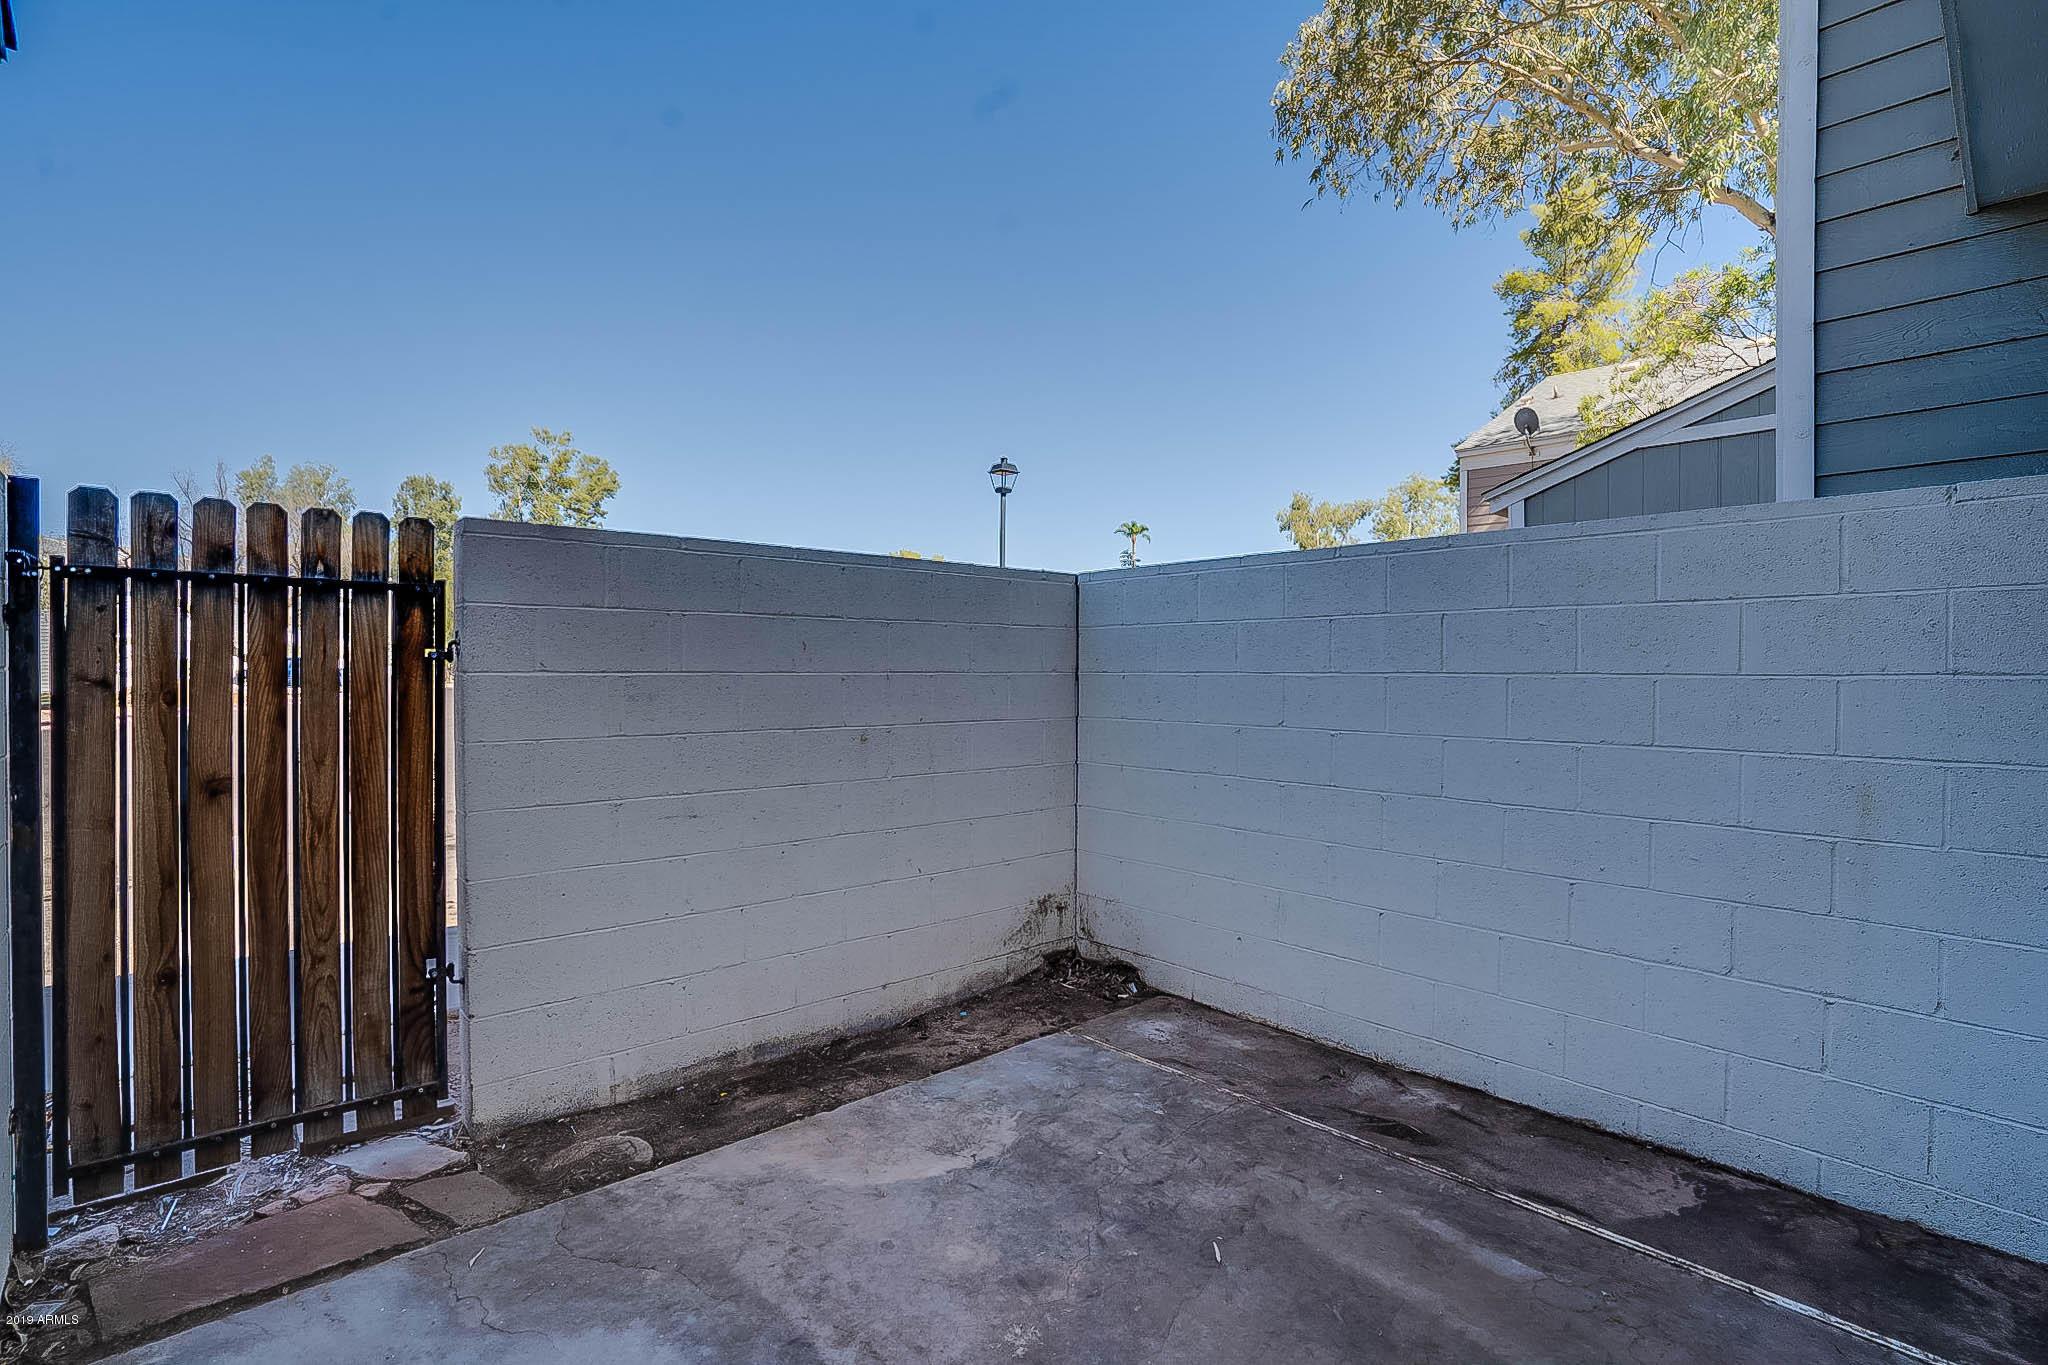 MLS 5968556 1600 N SABA Street Unit 164, Chandler, AZ 85225 Chandler AZ Townhome